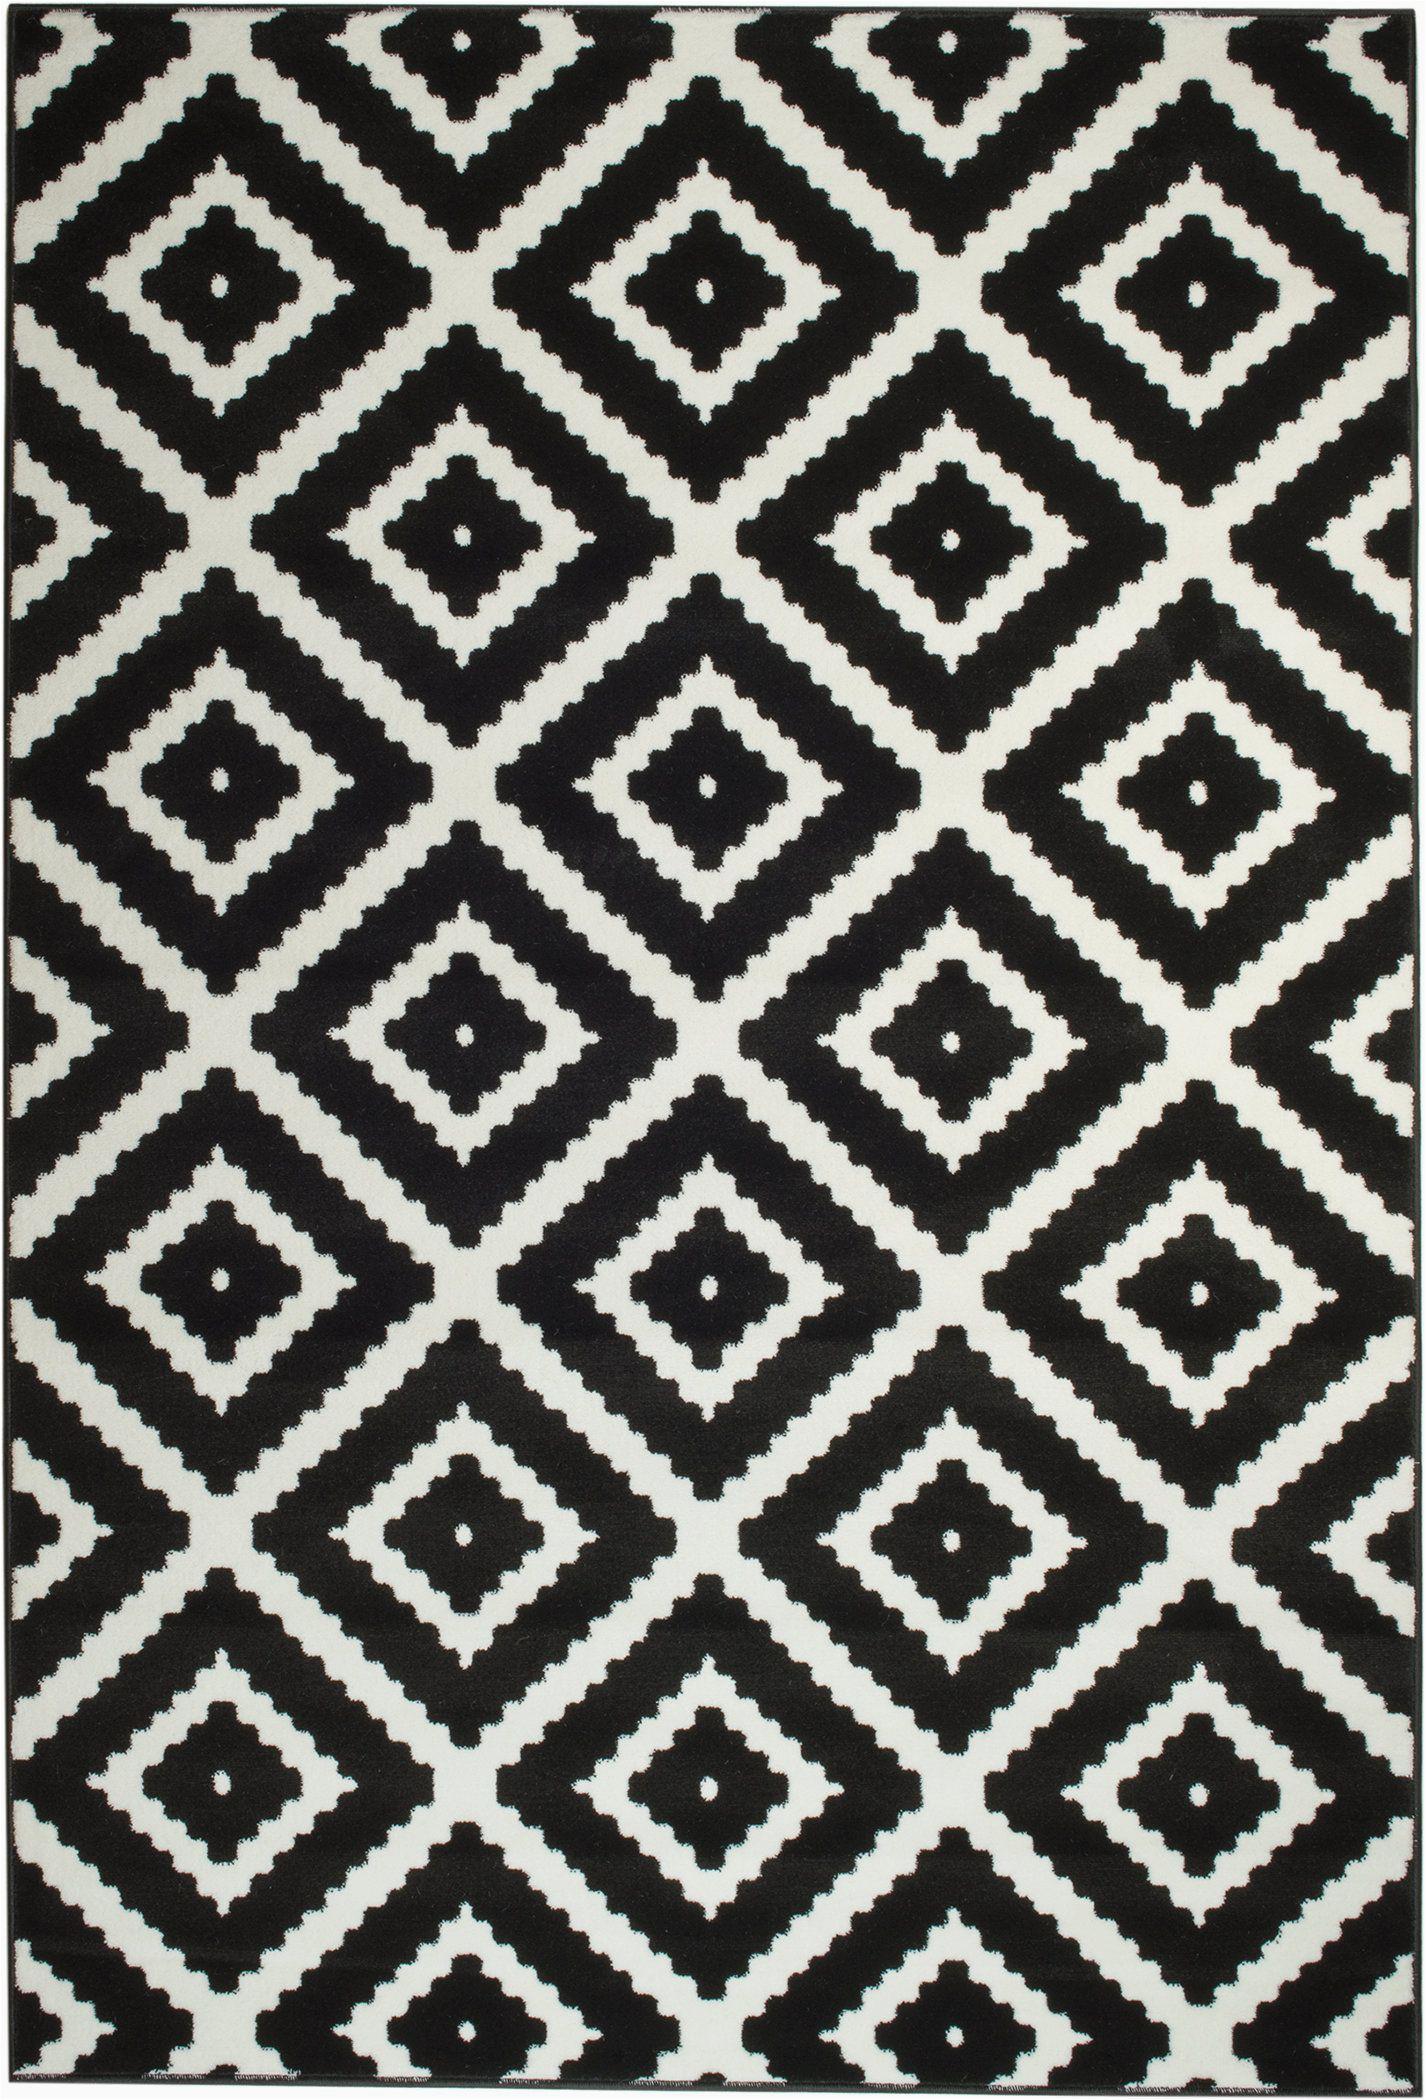 Area Rugs Black and White Pattern Leana Black Indoor area Rug Joss & Main